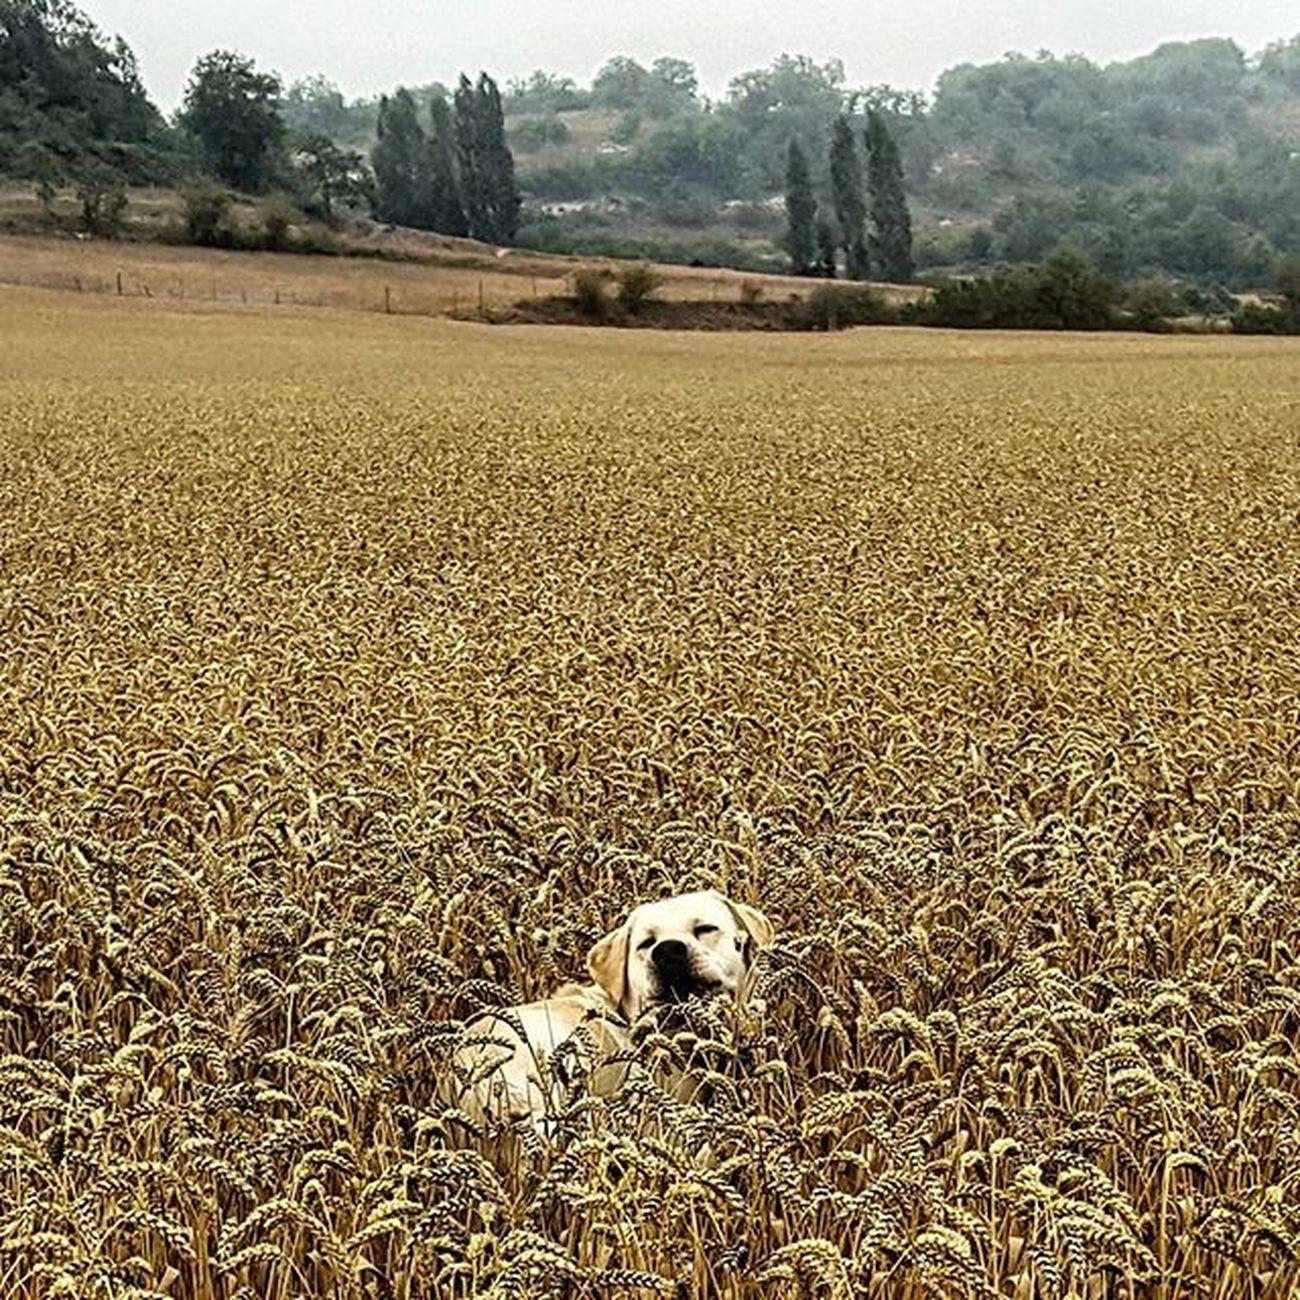 Mi peque metido en la cebada Cebada Labrador Retriever Burgos paseo naturaleza igersnaturaleza